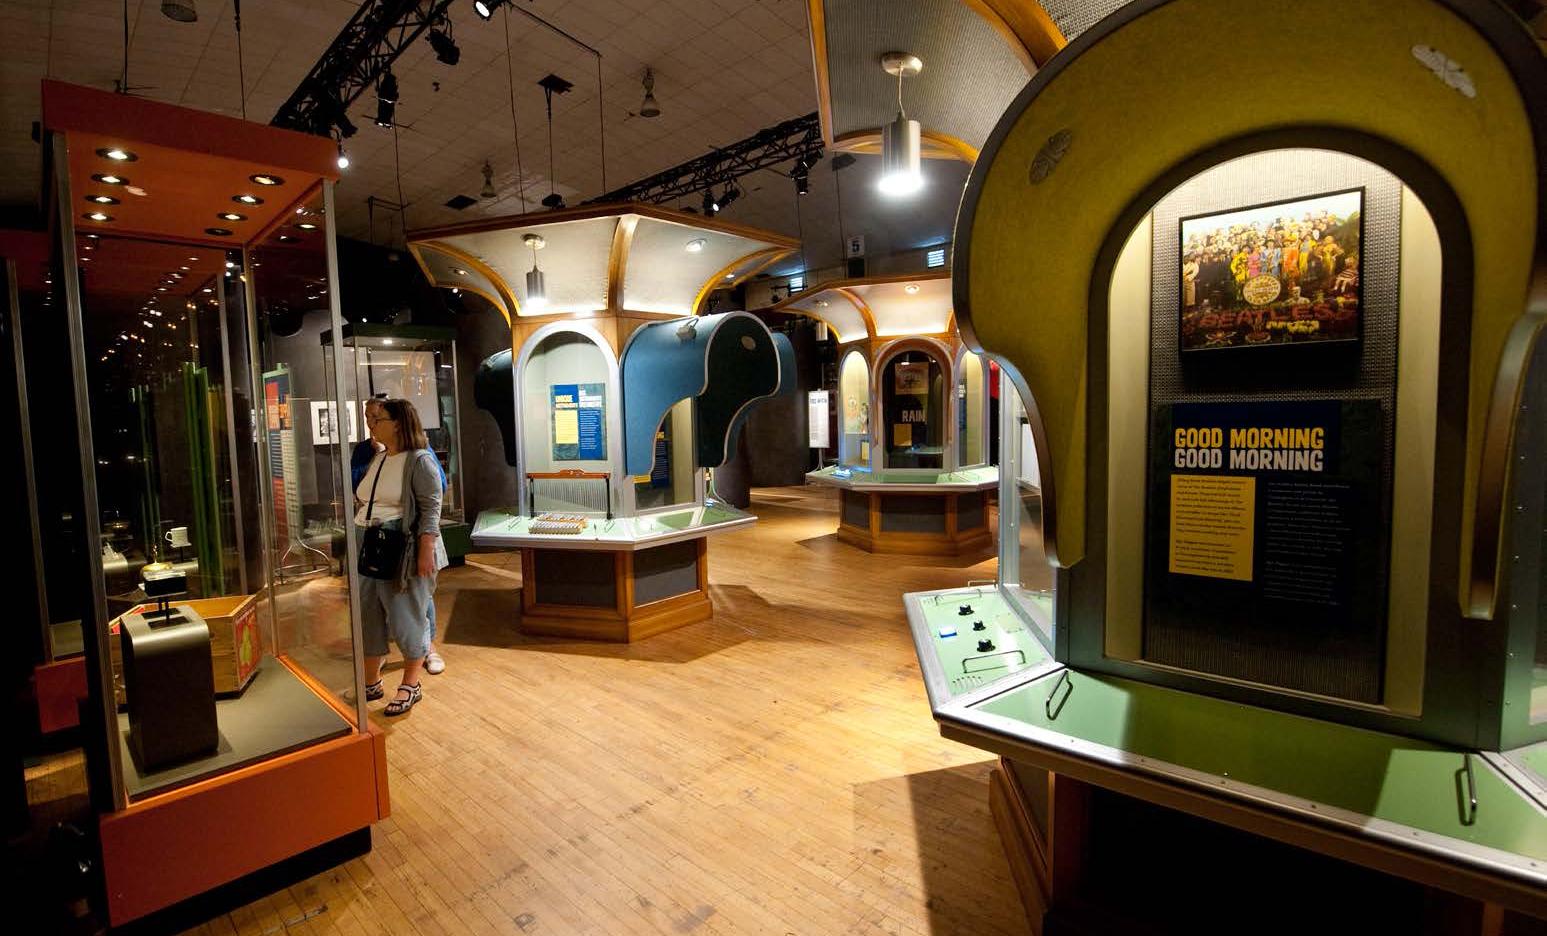 The Magical History Tour: A Beatles Memorabilia Exhibition